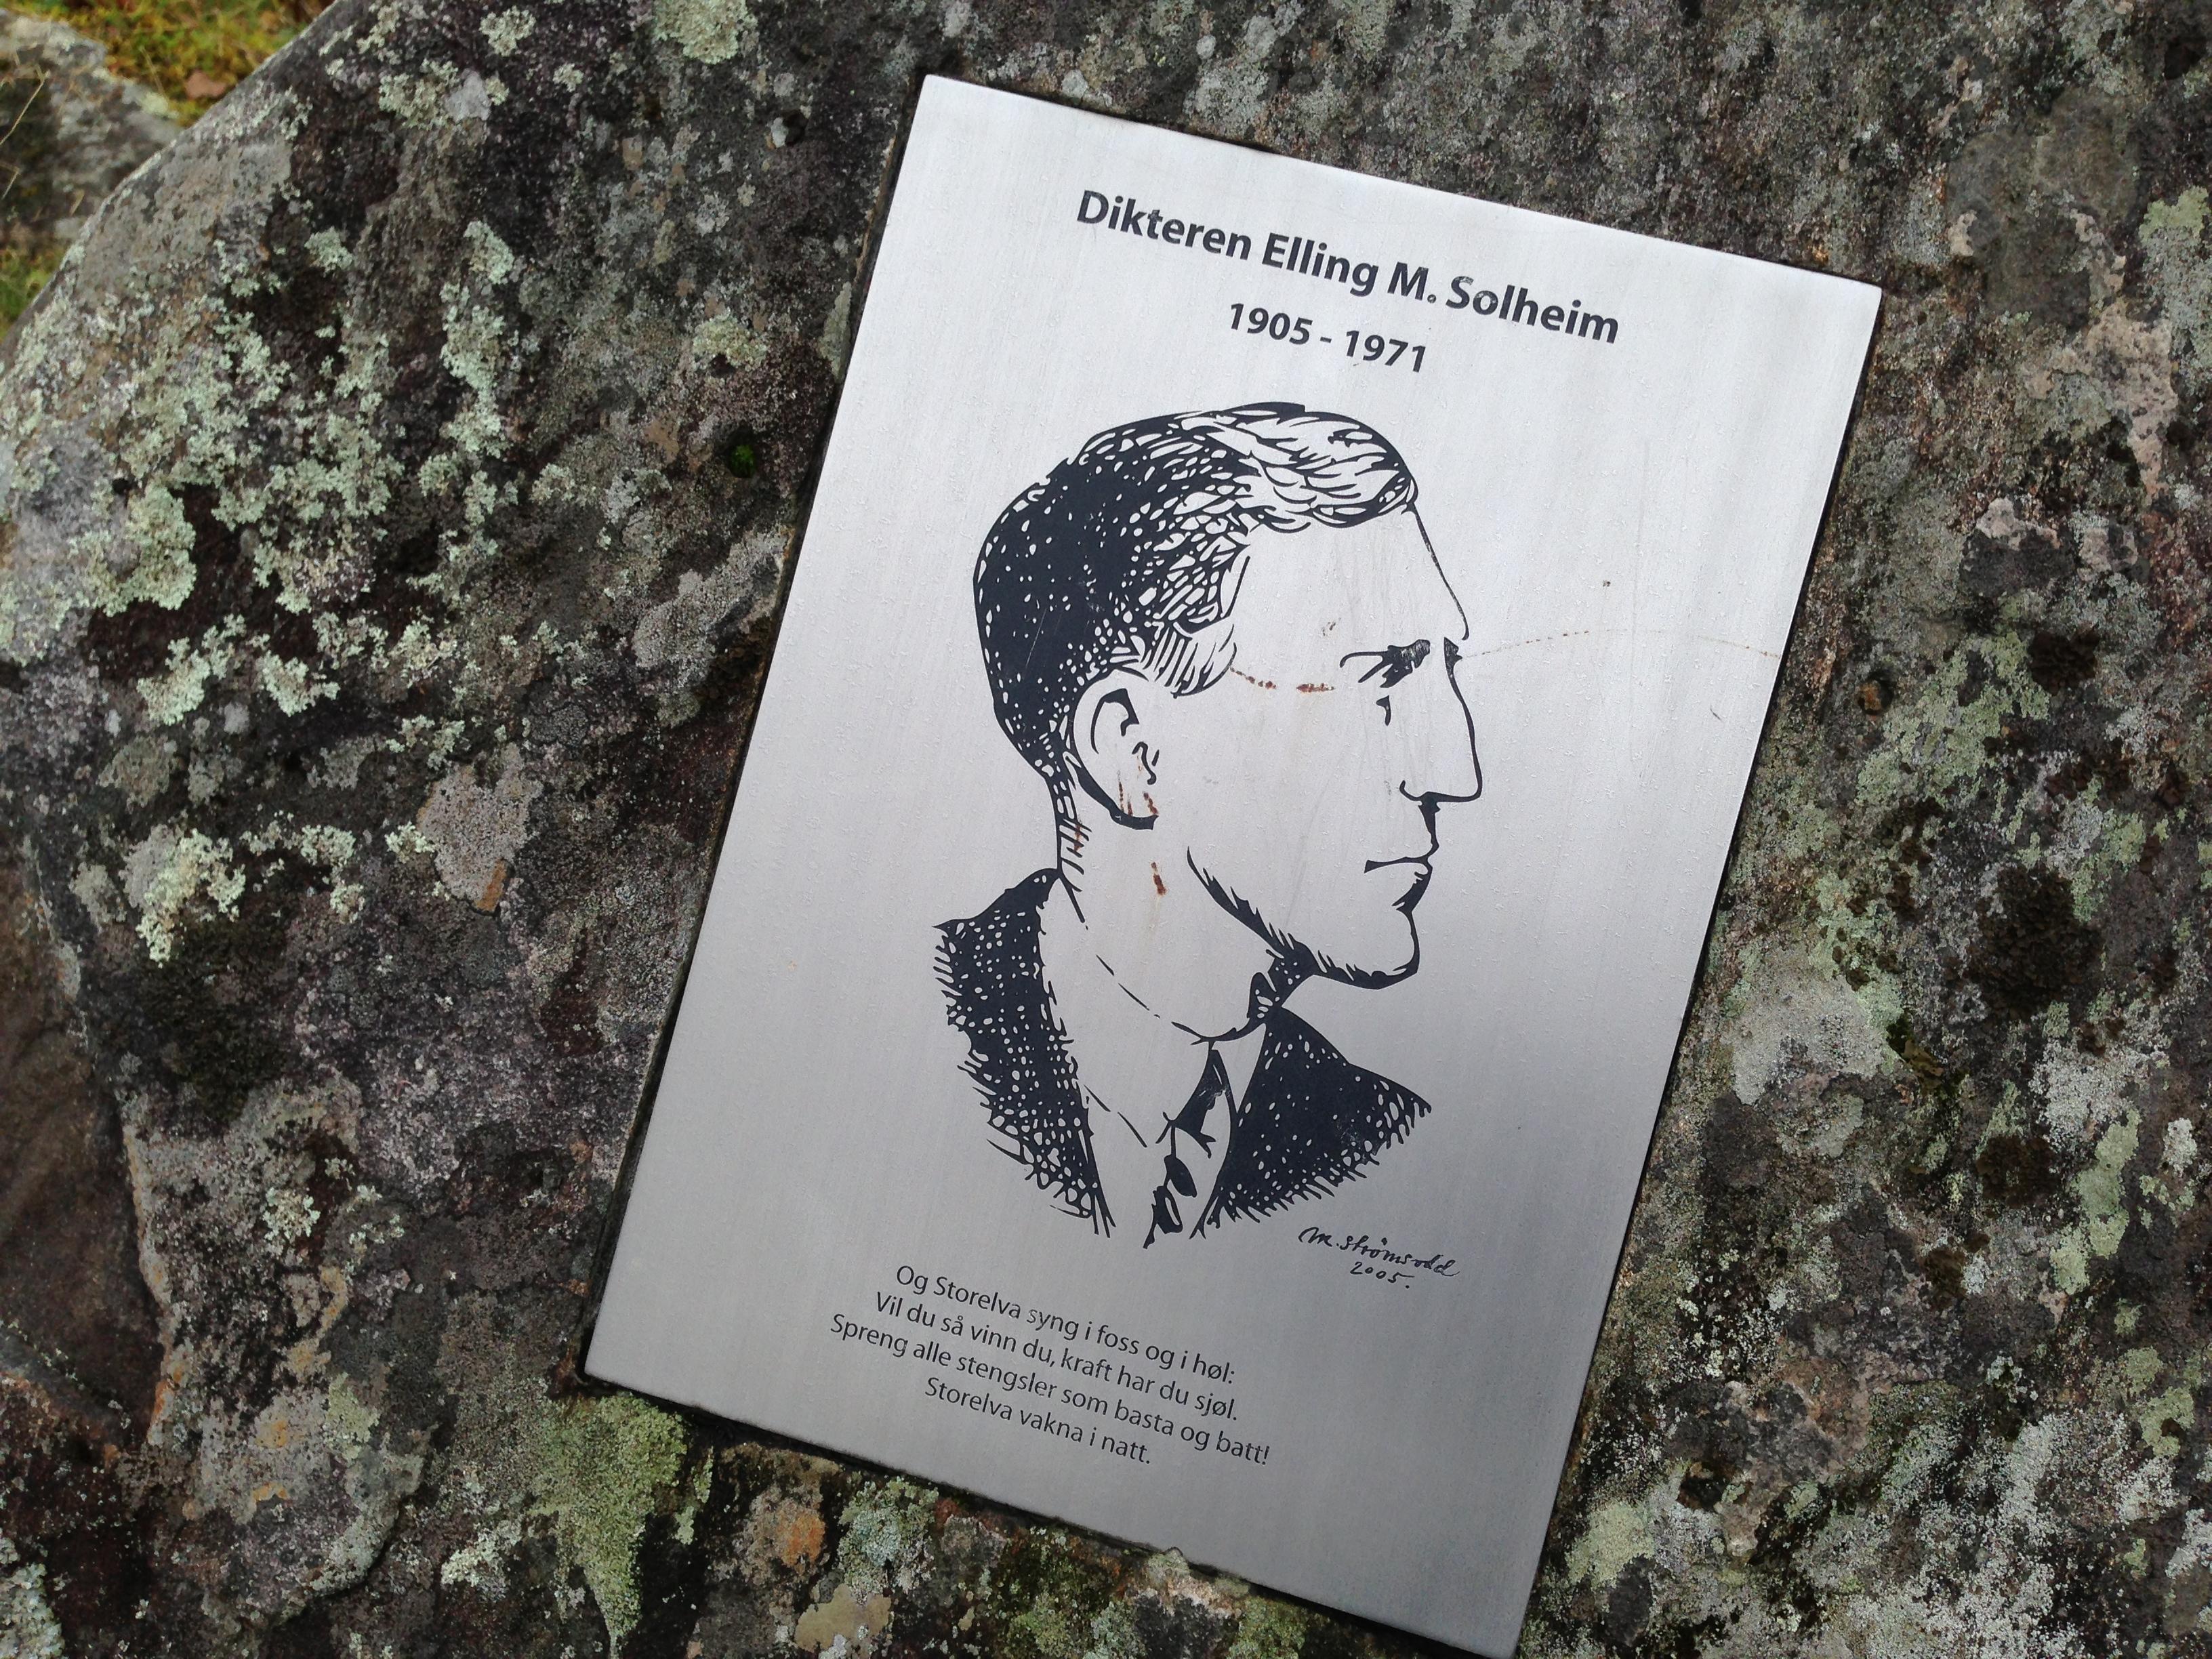 Minneplakket for Elling M. Solheim.